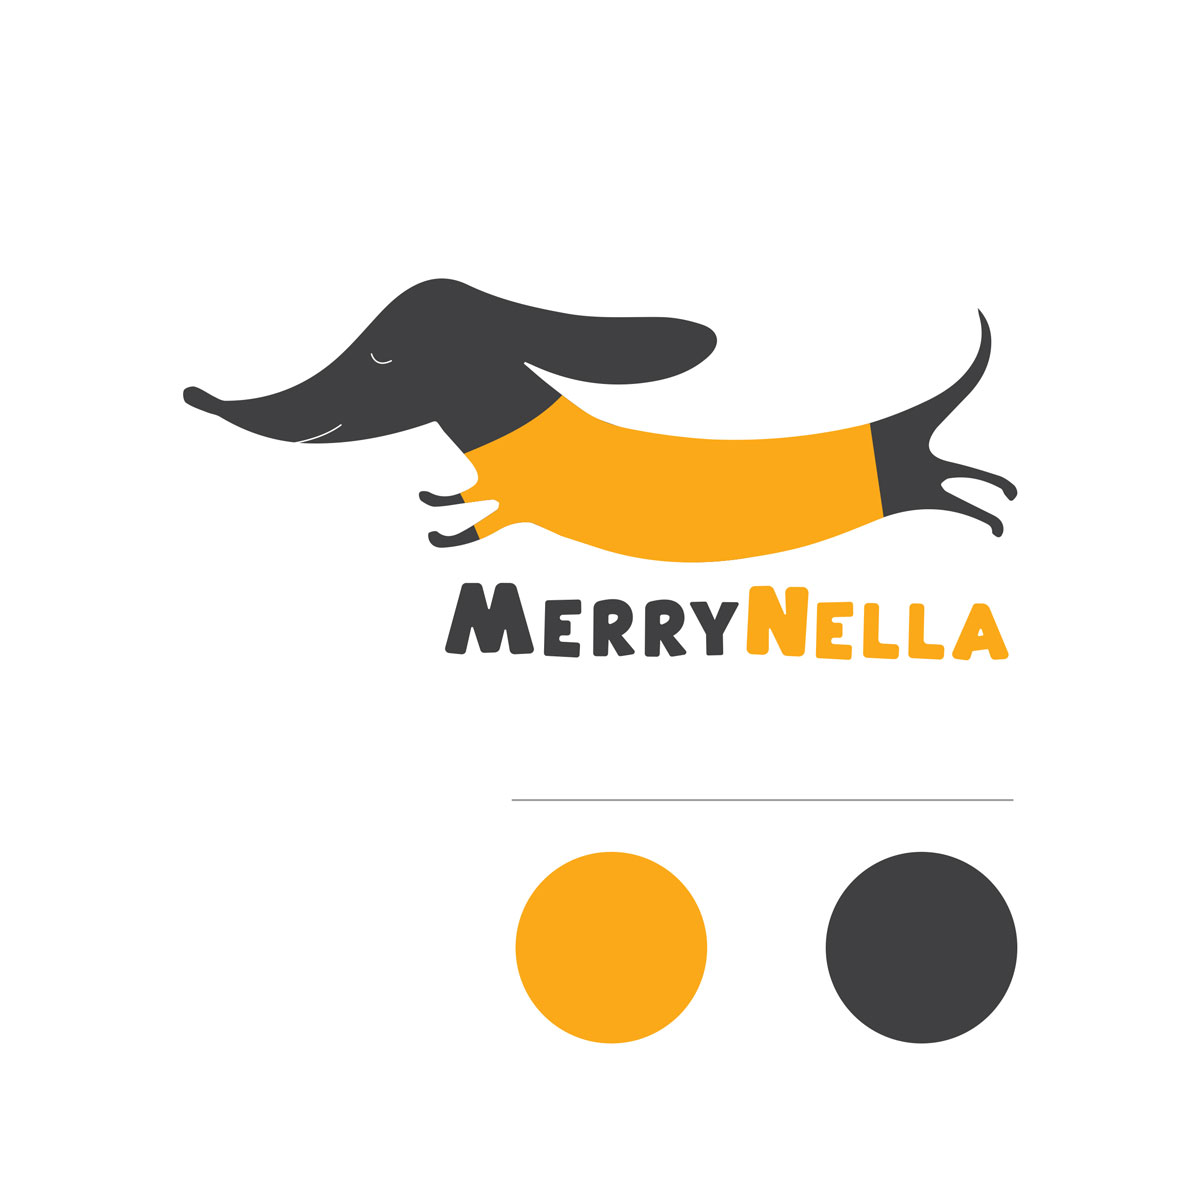 merrynella - monisattler